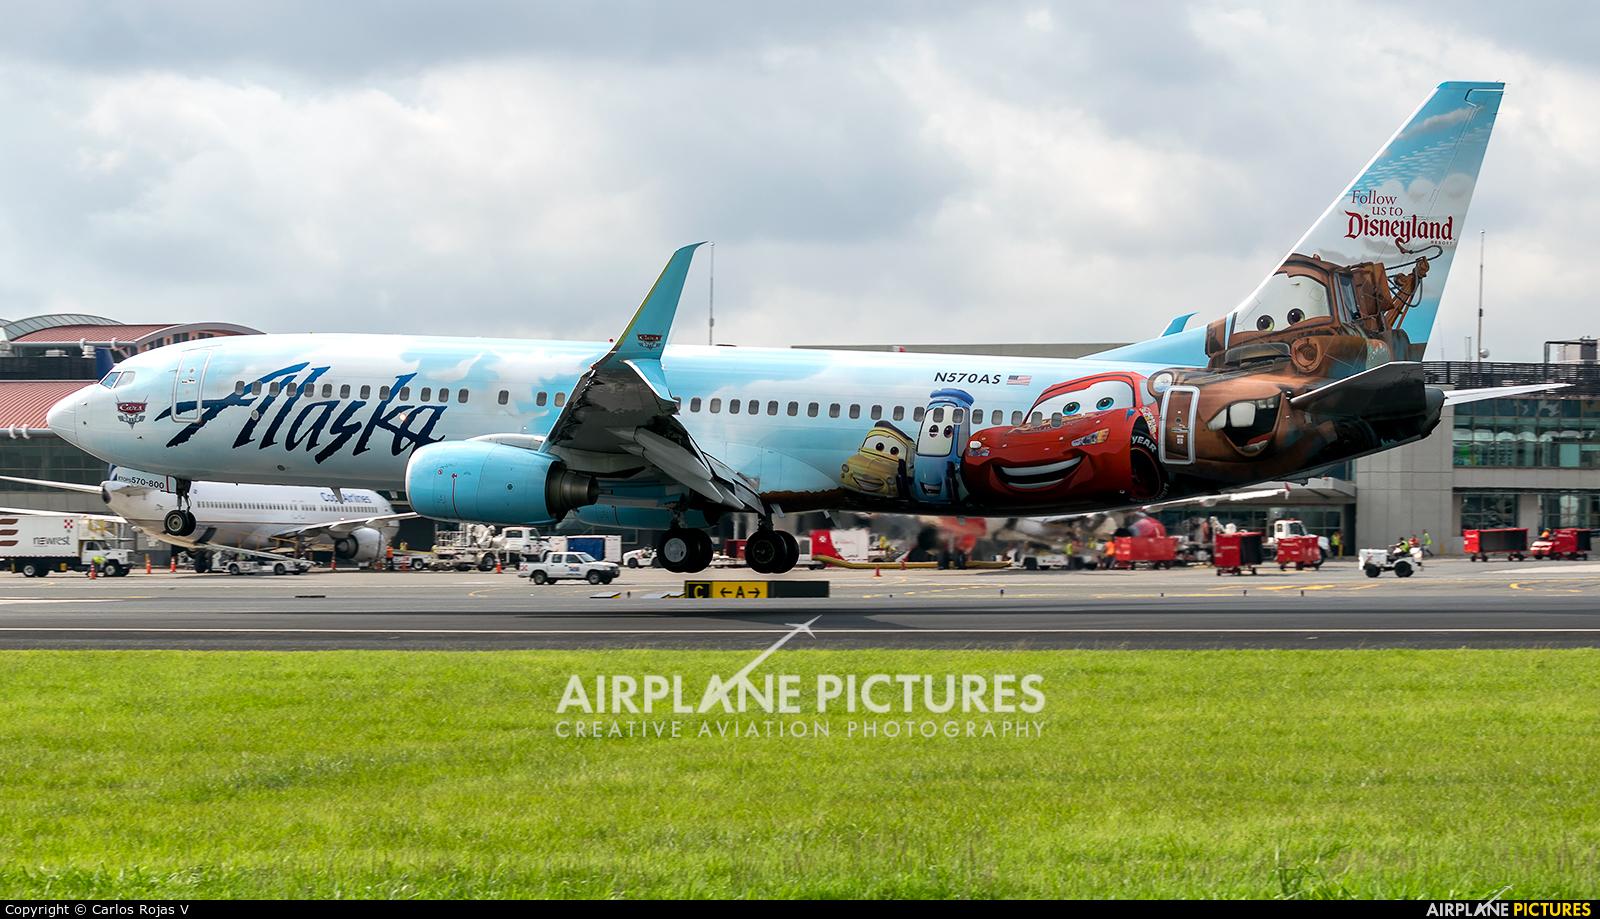 Alaska Airlines N570AS aircraft at San Jose - Juan Santamaría Intl